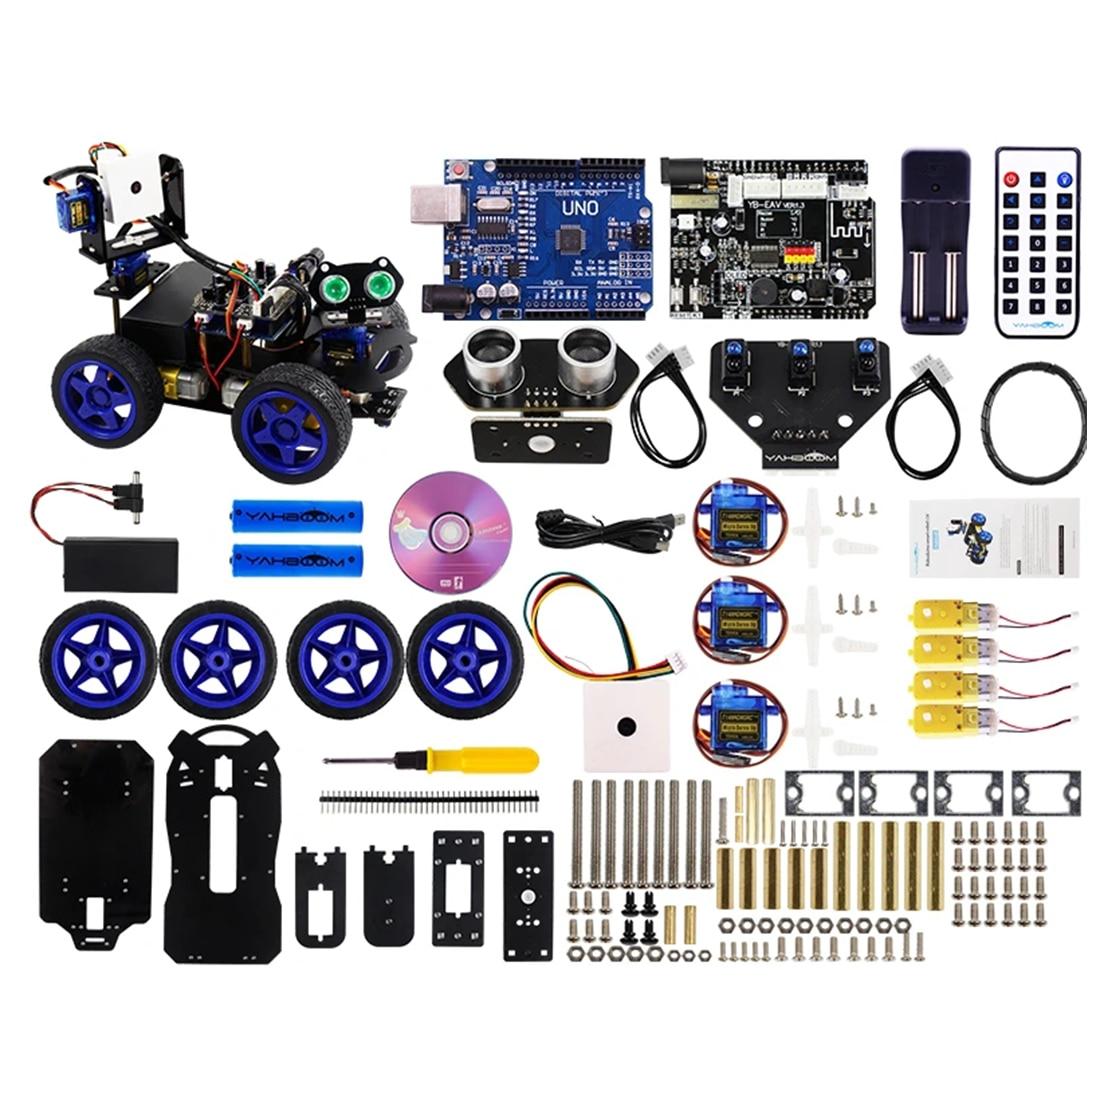 Scratch3.0 Luminescent Ultrasonic Module Smart Robot Car Wifi Camera Gimbal Kit For Arduino (No /With Battery)